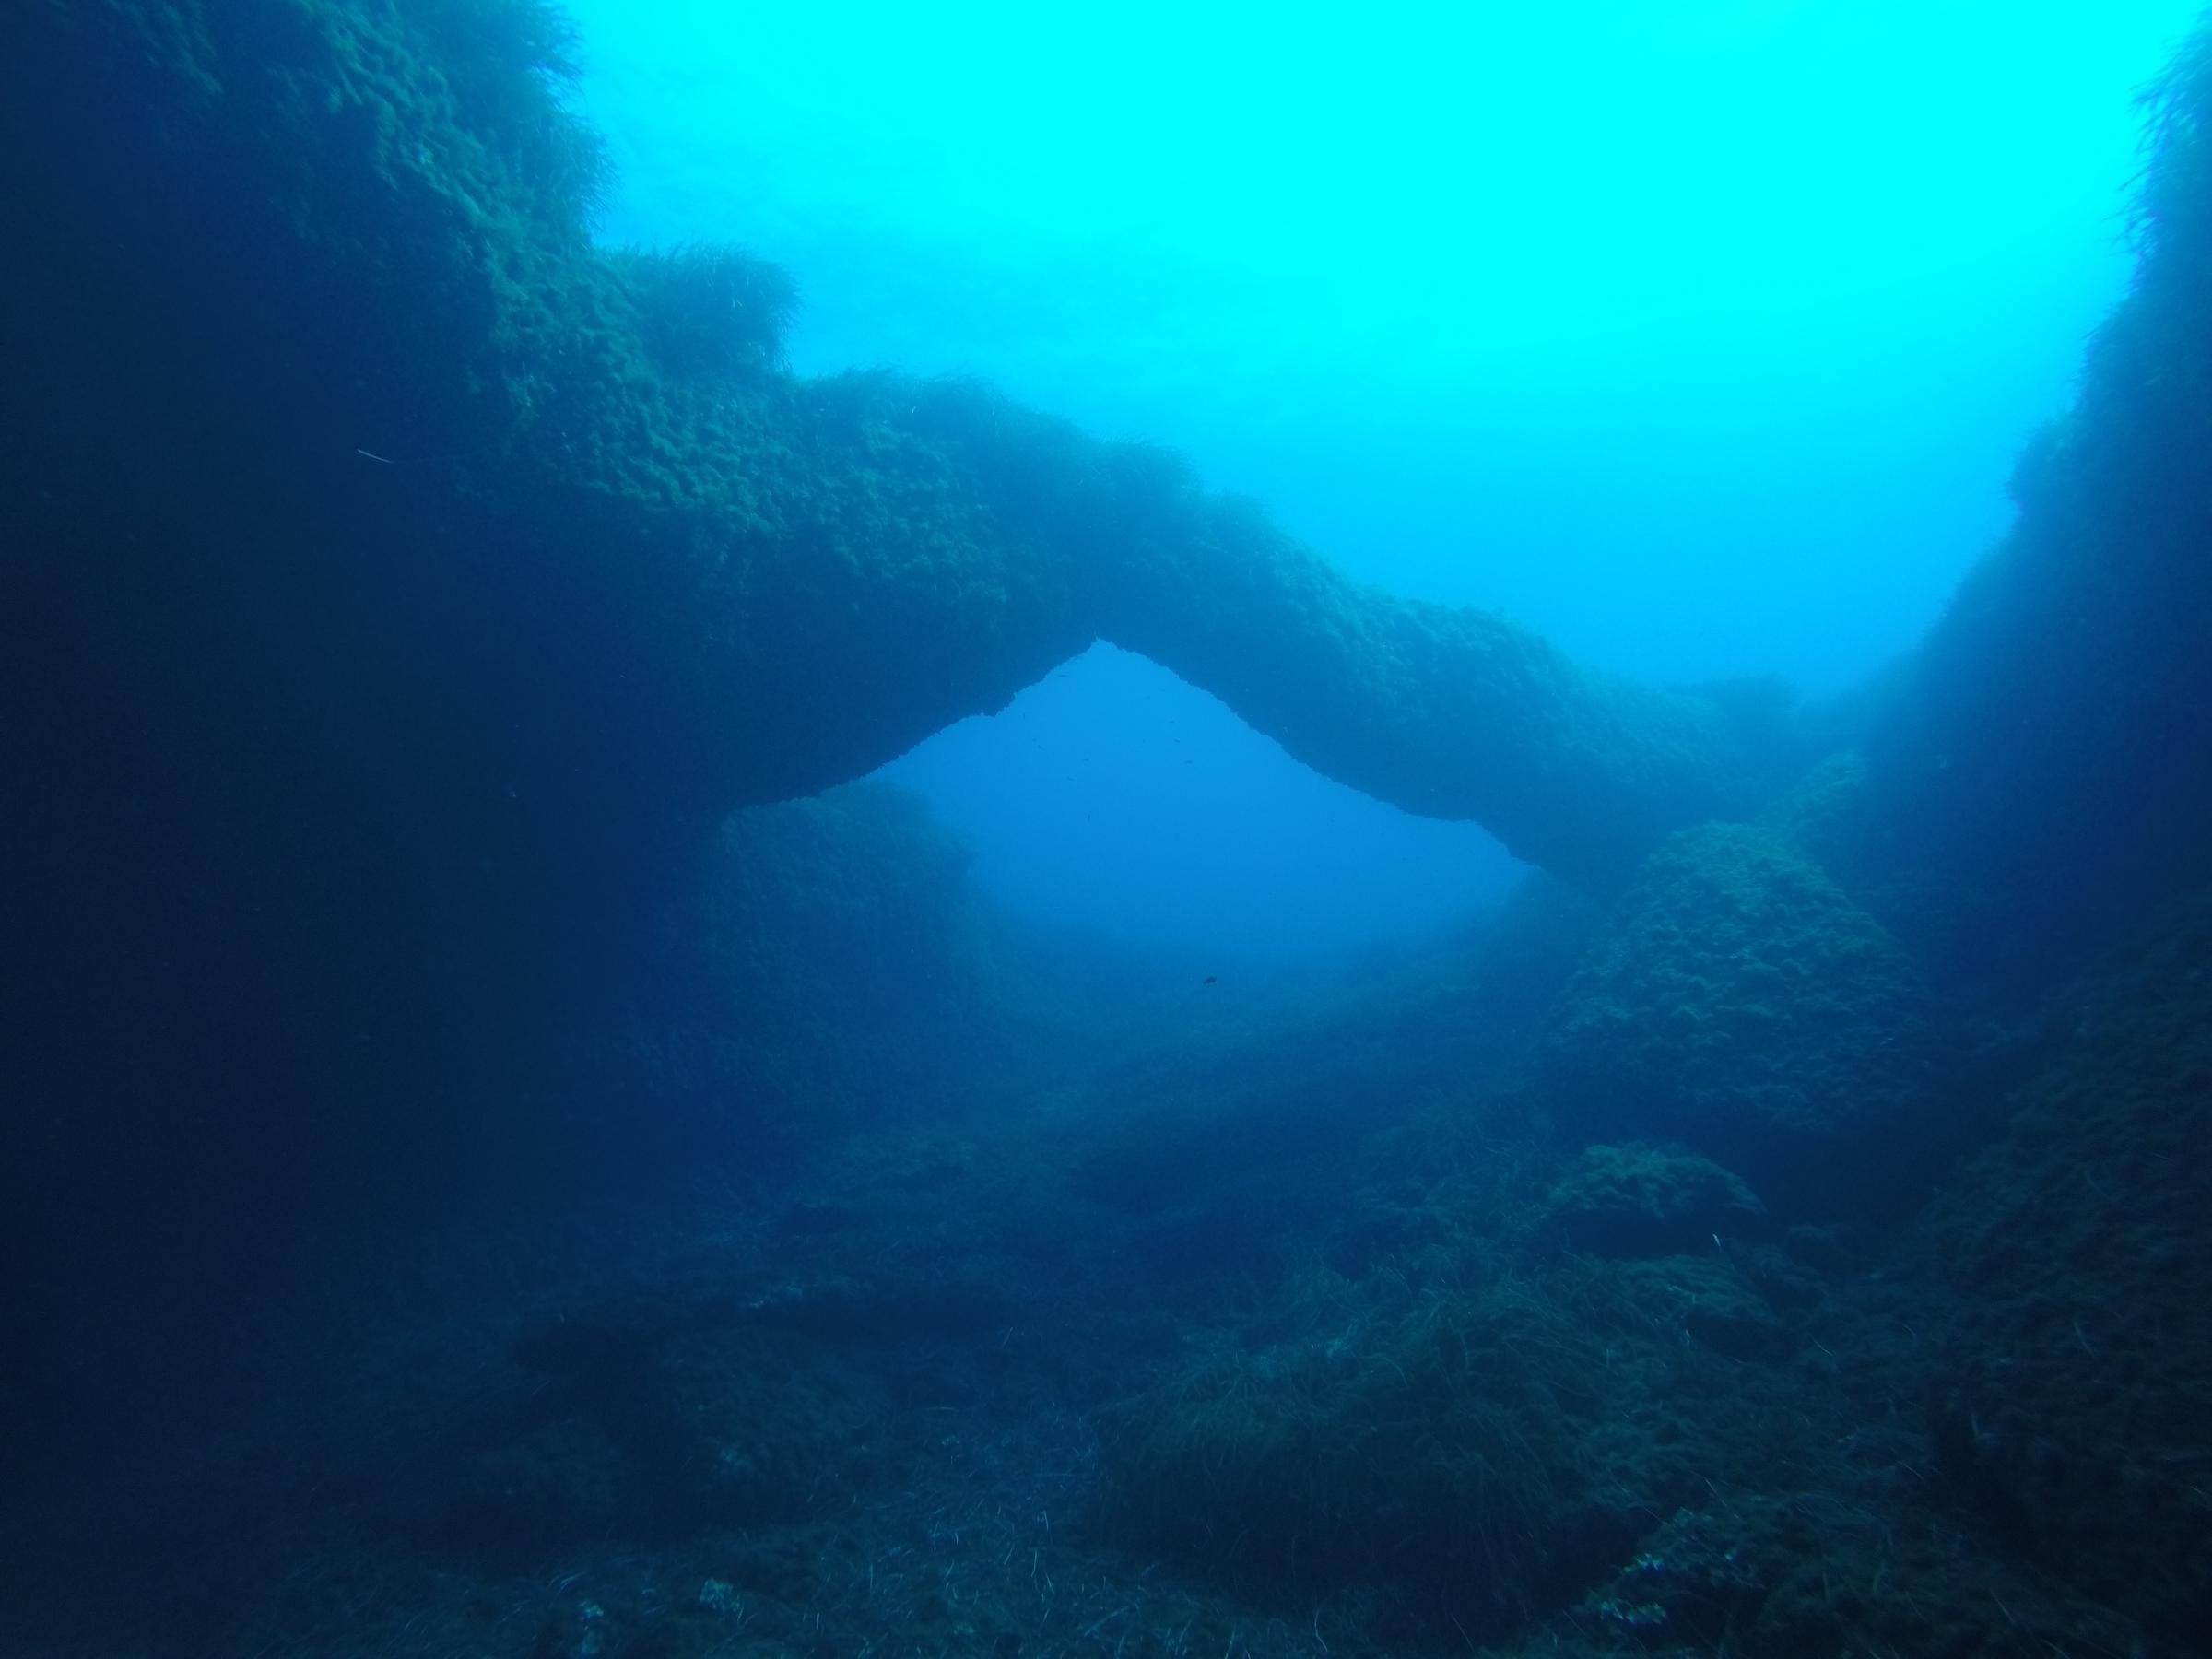 Triple arch, Xwejni Bay, Gozo